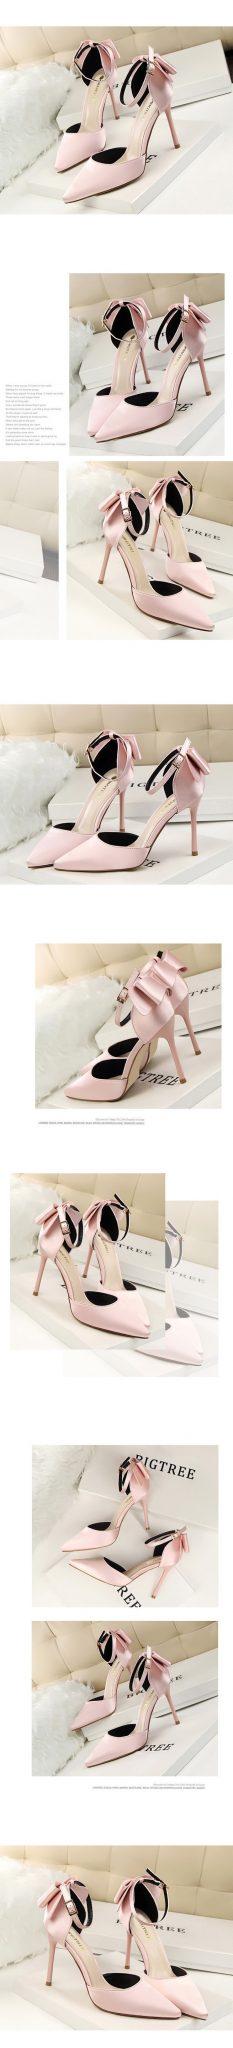 Women's Korean Fashion Hollow Back Bow Design High Heels